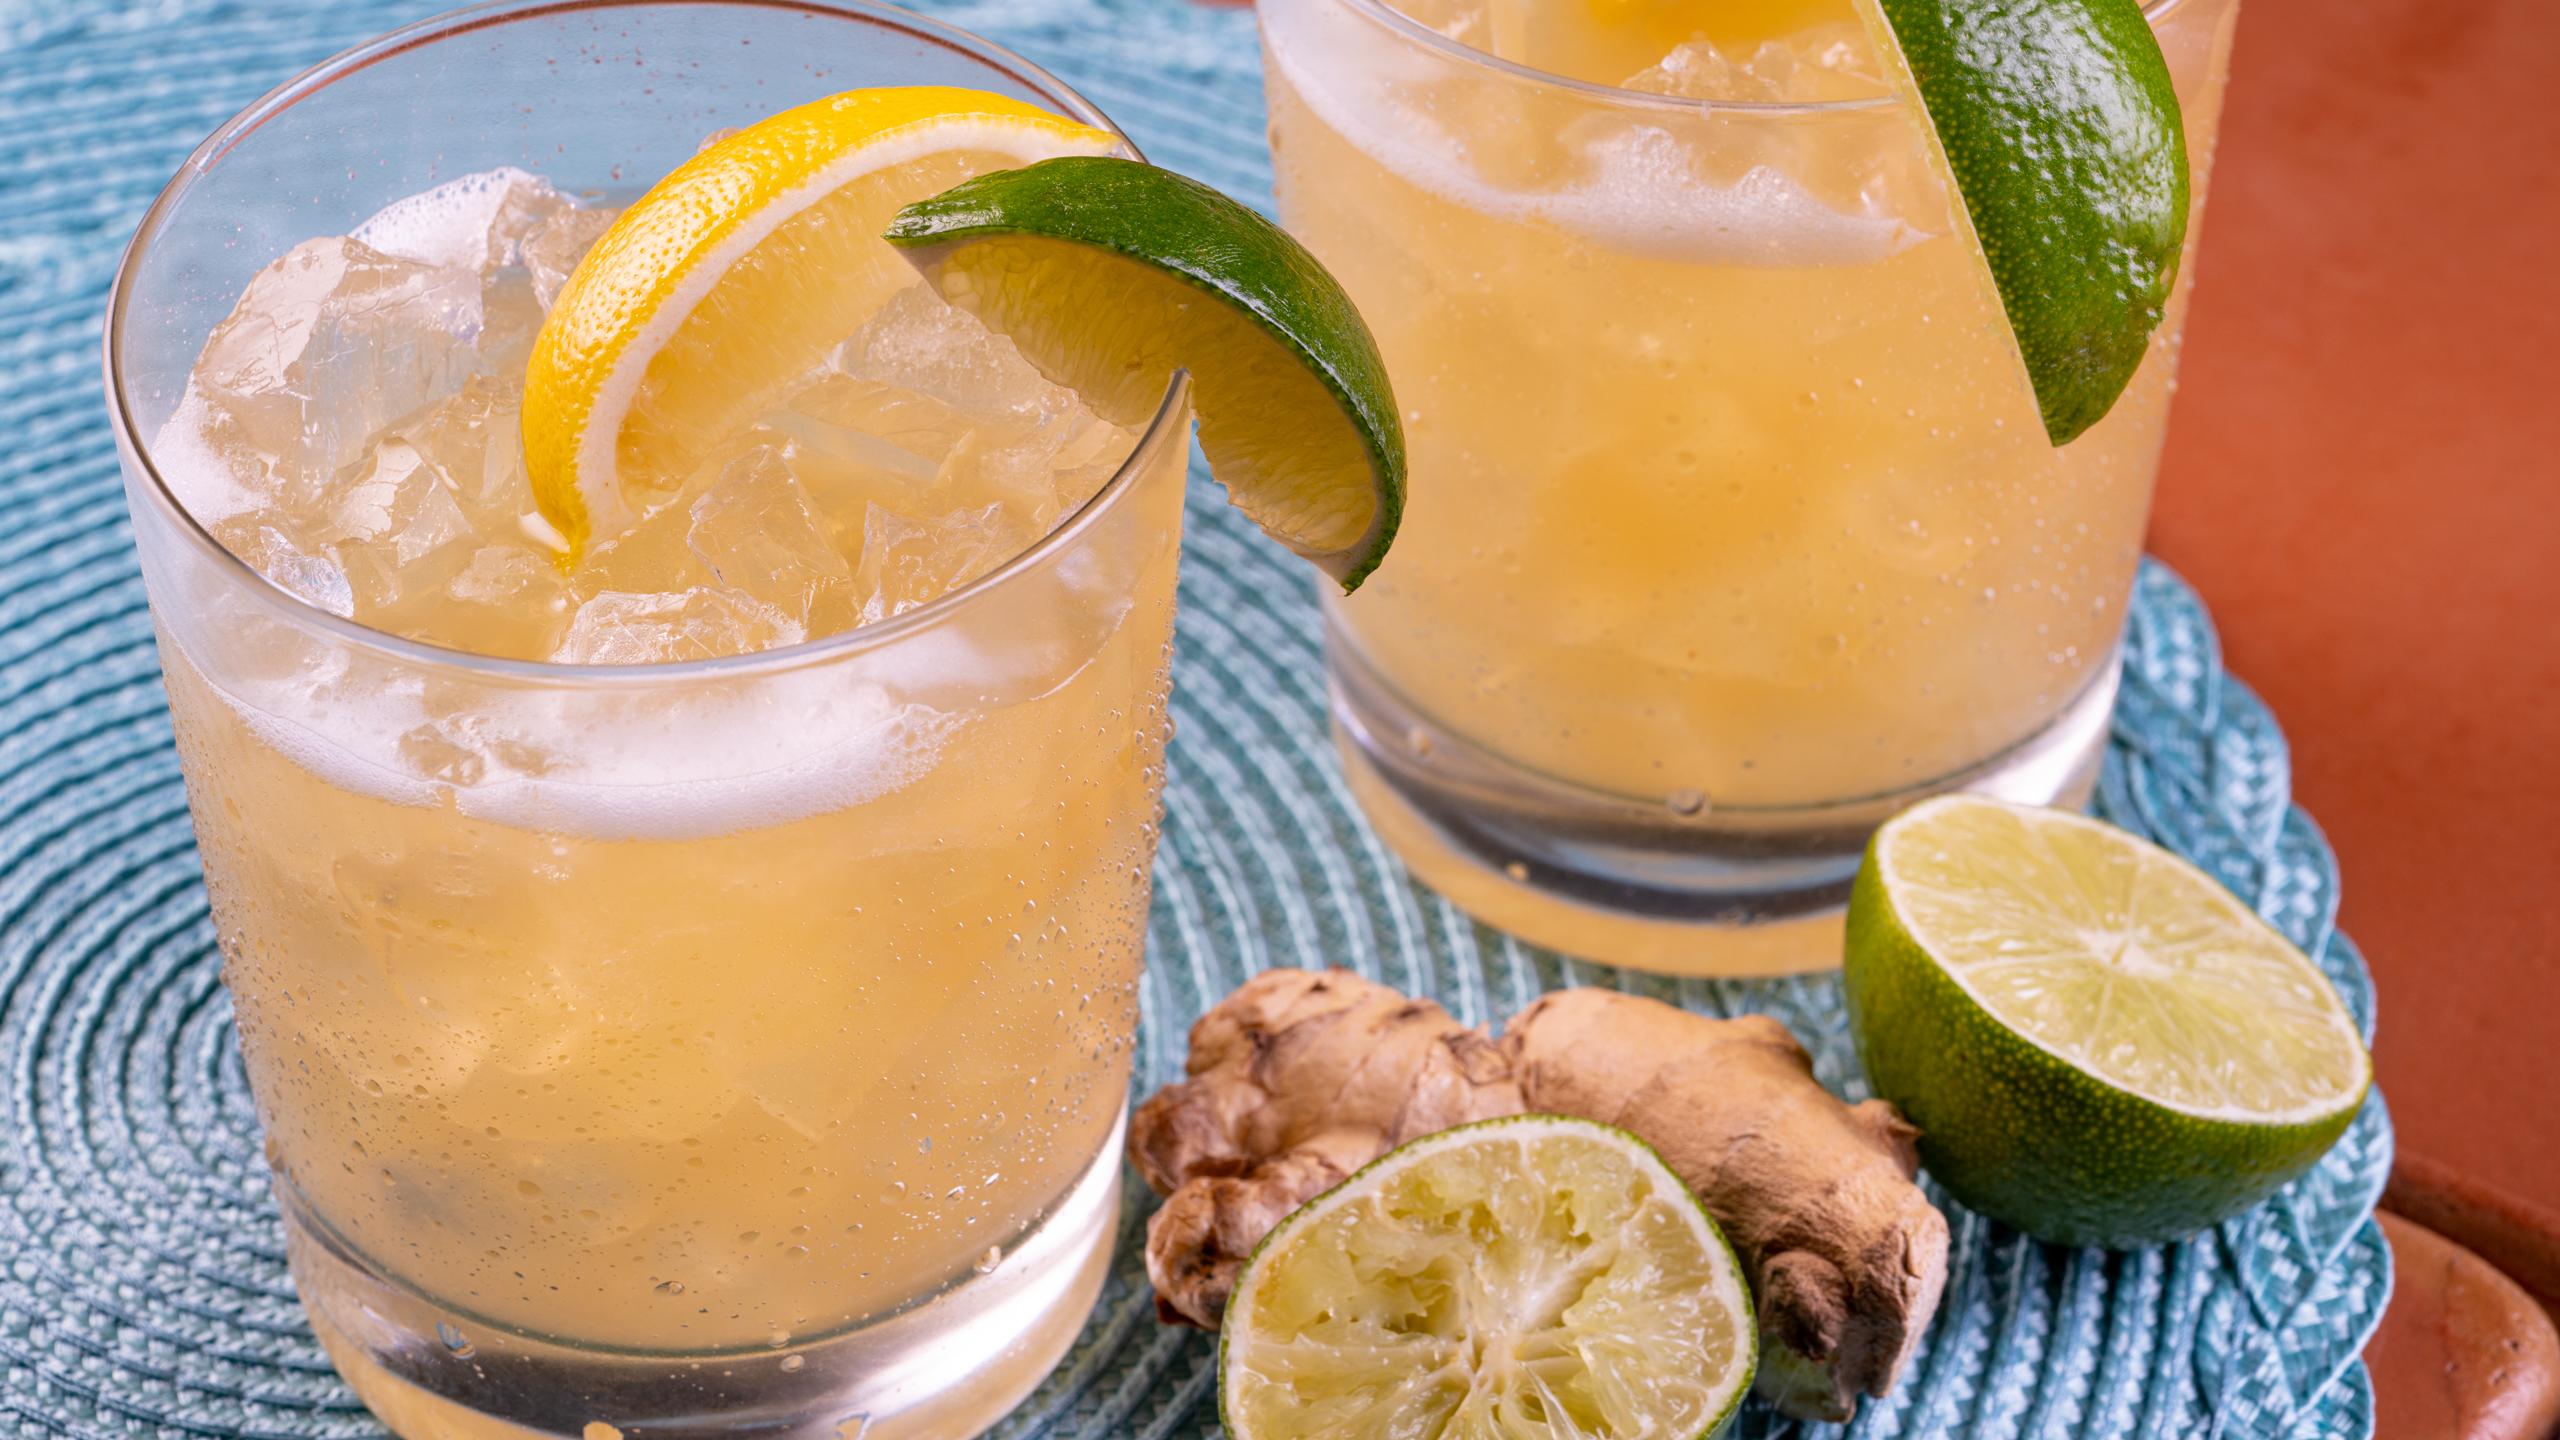 receta de tequila